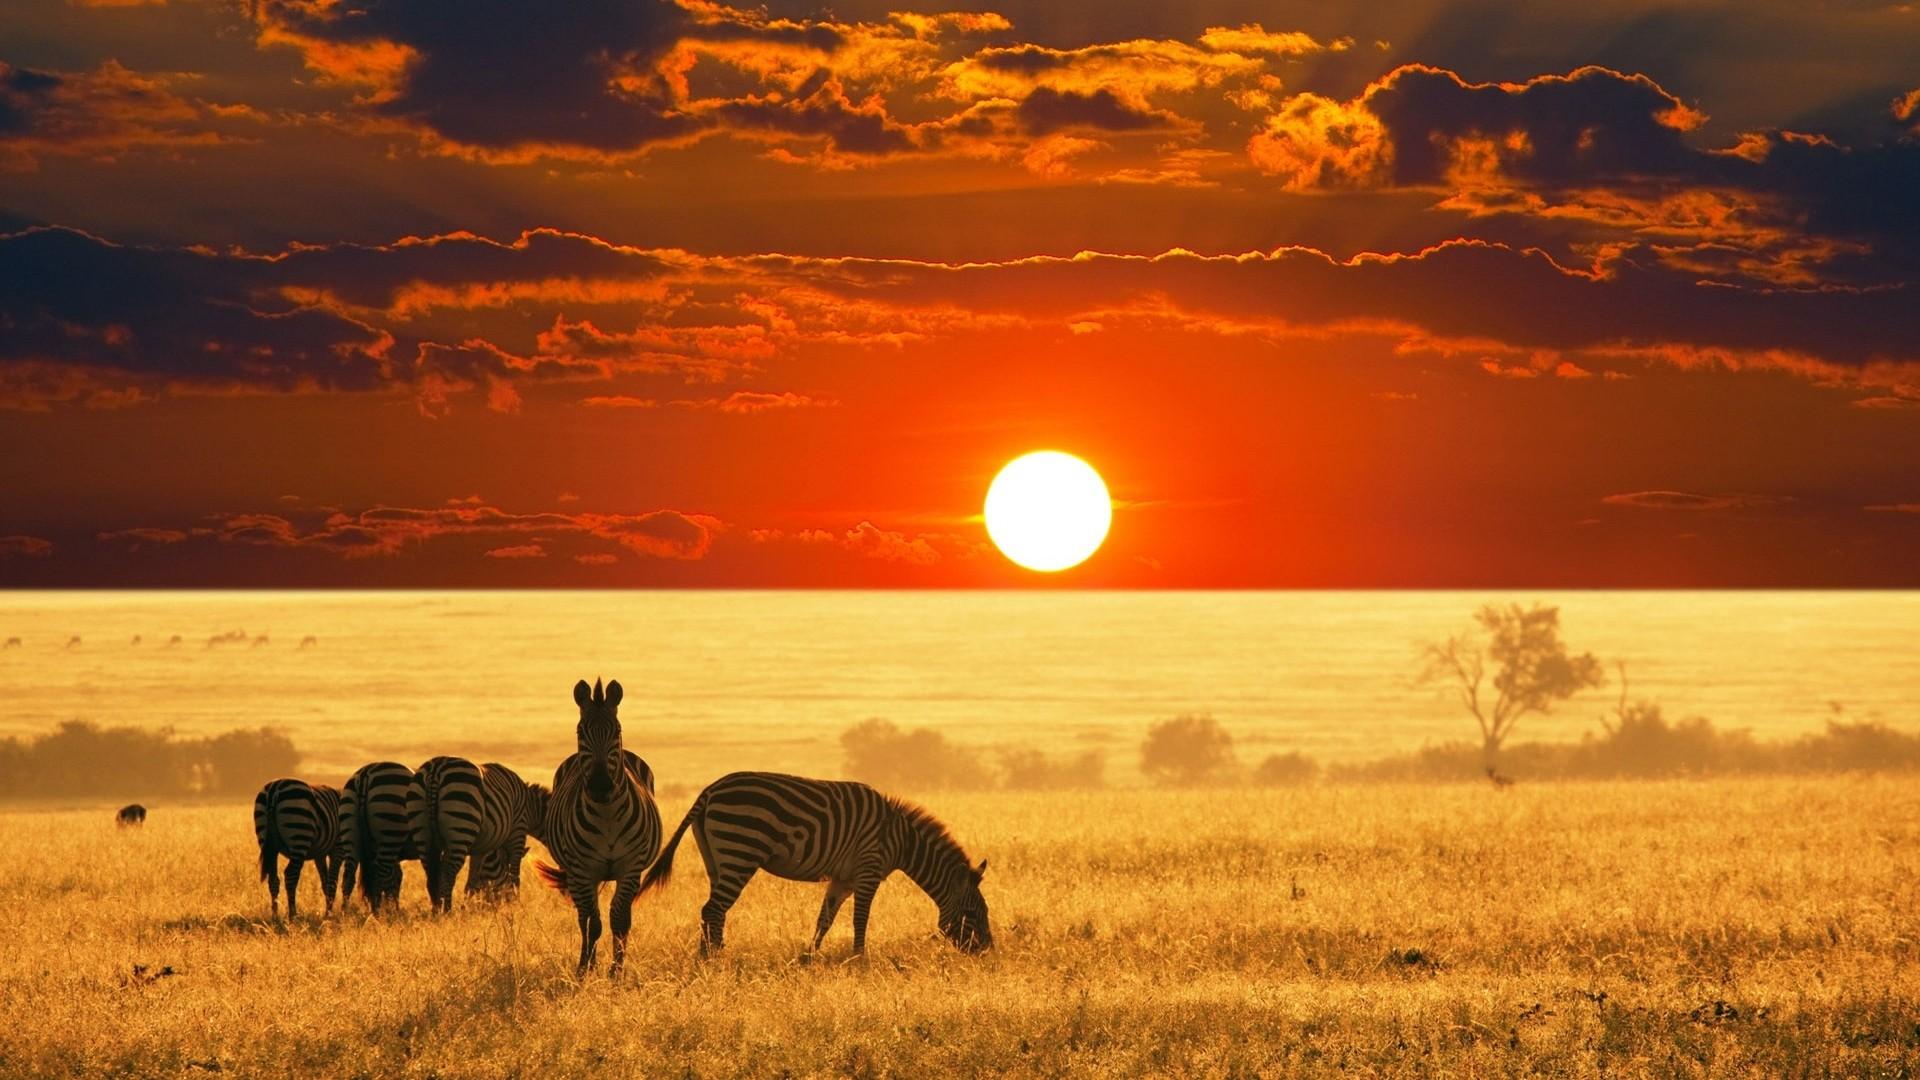 afrikanskoe-safari-idealnyy-otpusk-1